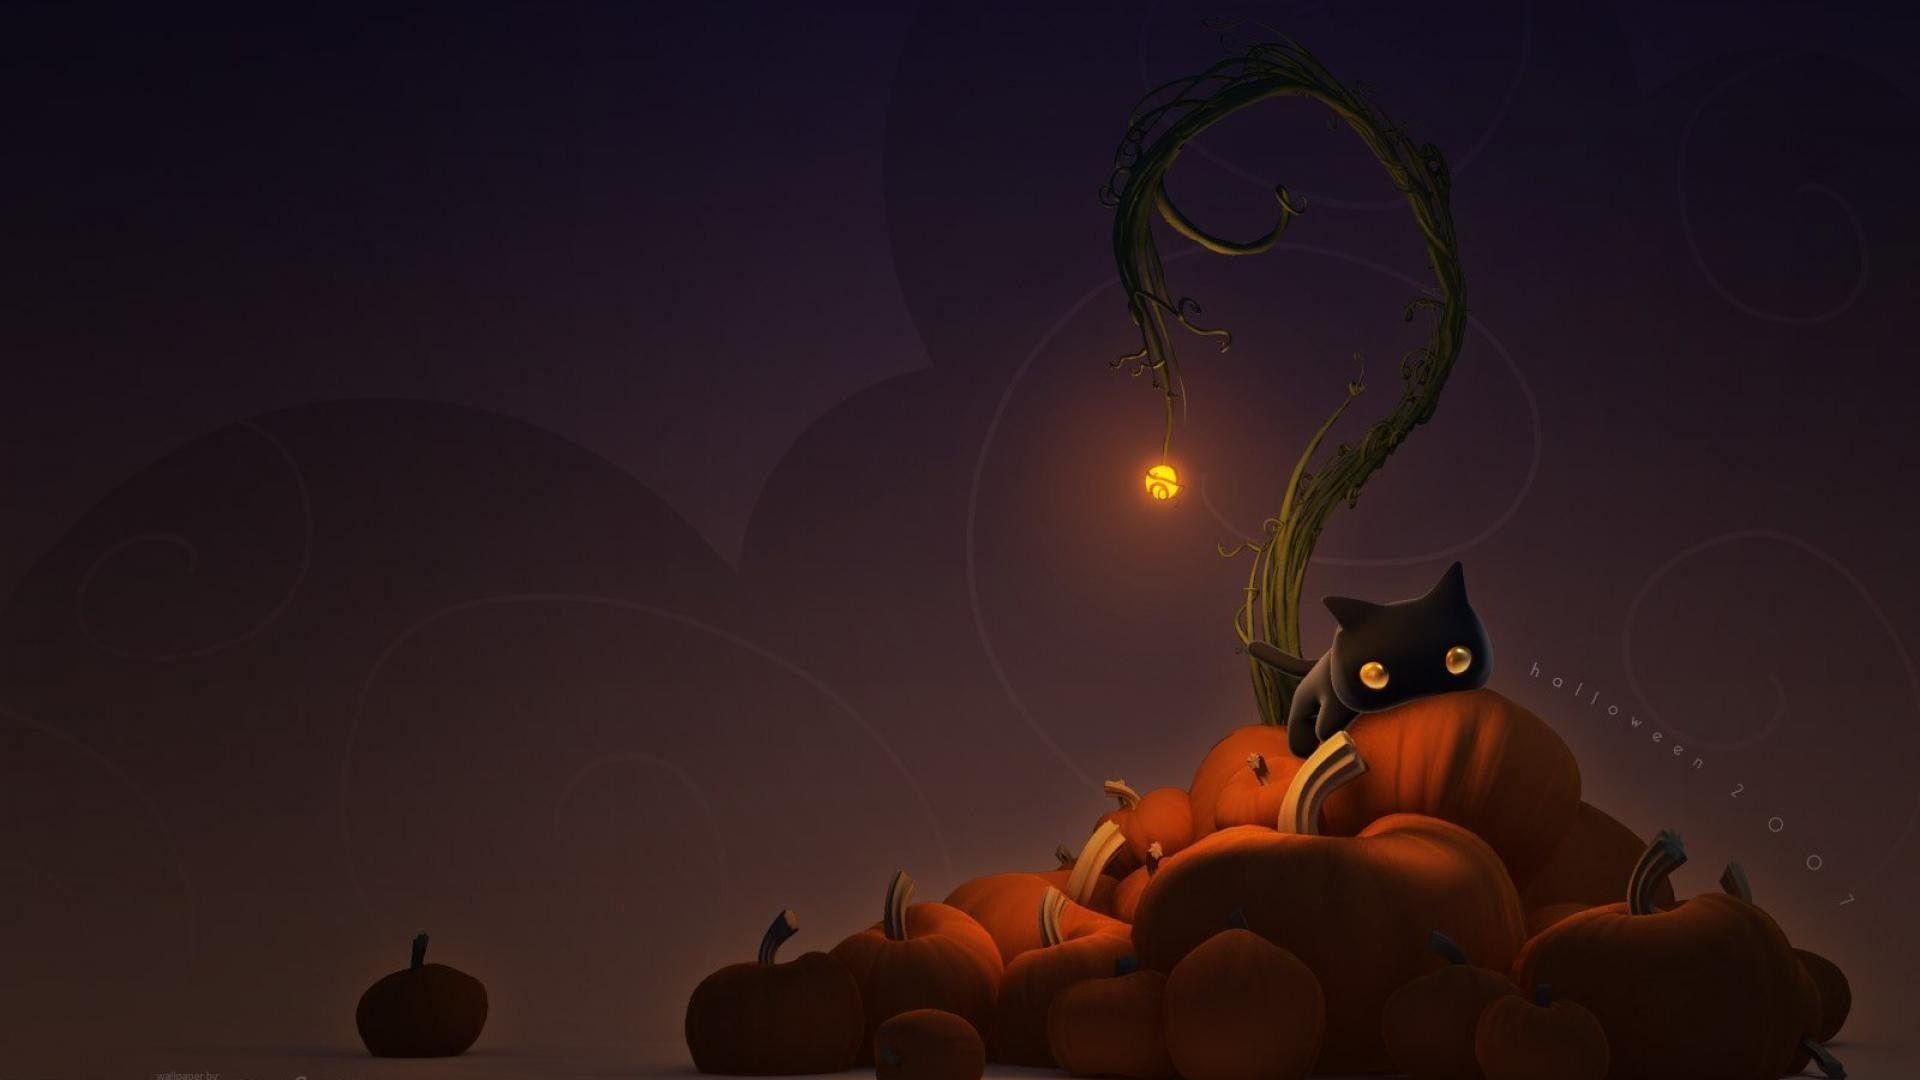 Black Cat Halloween Wallpapers Top Free Black Cat Halloween Backgrounds Wallpaperaccess